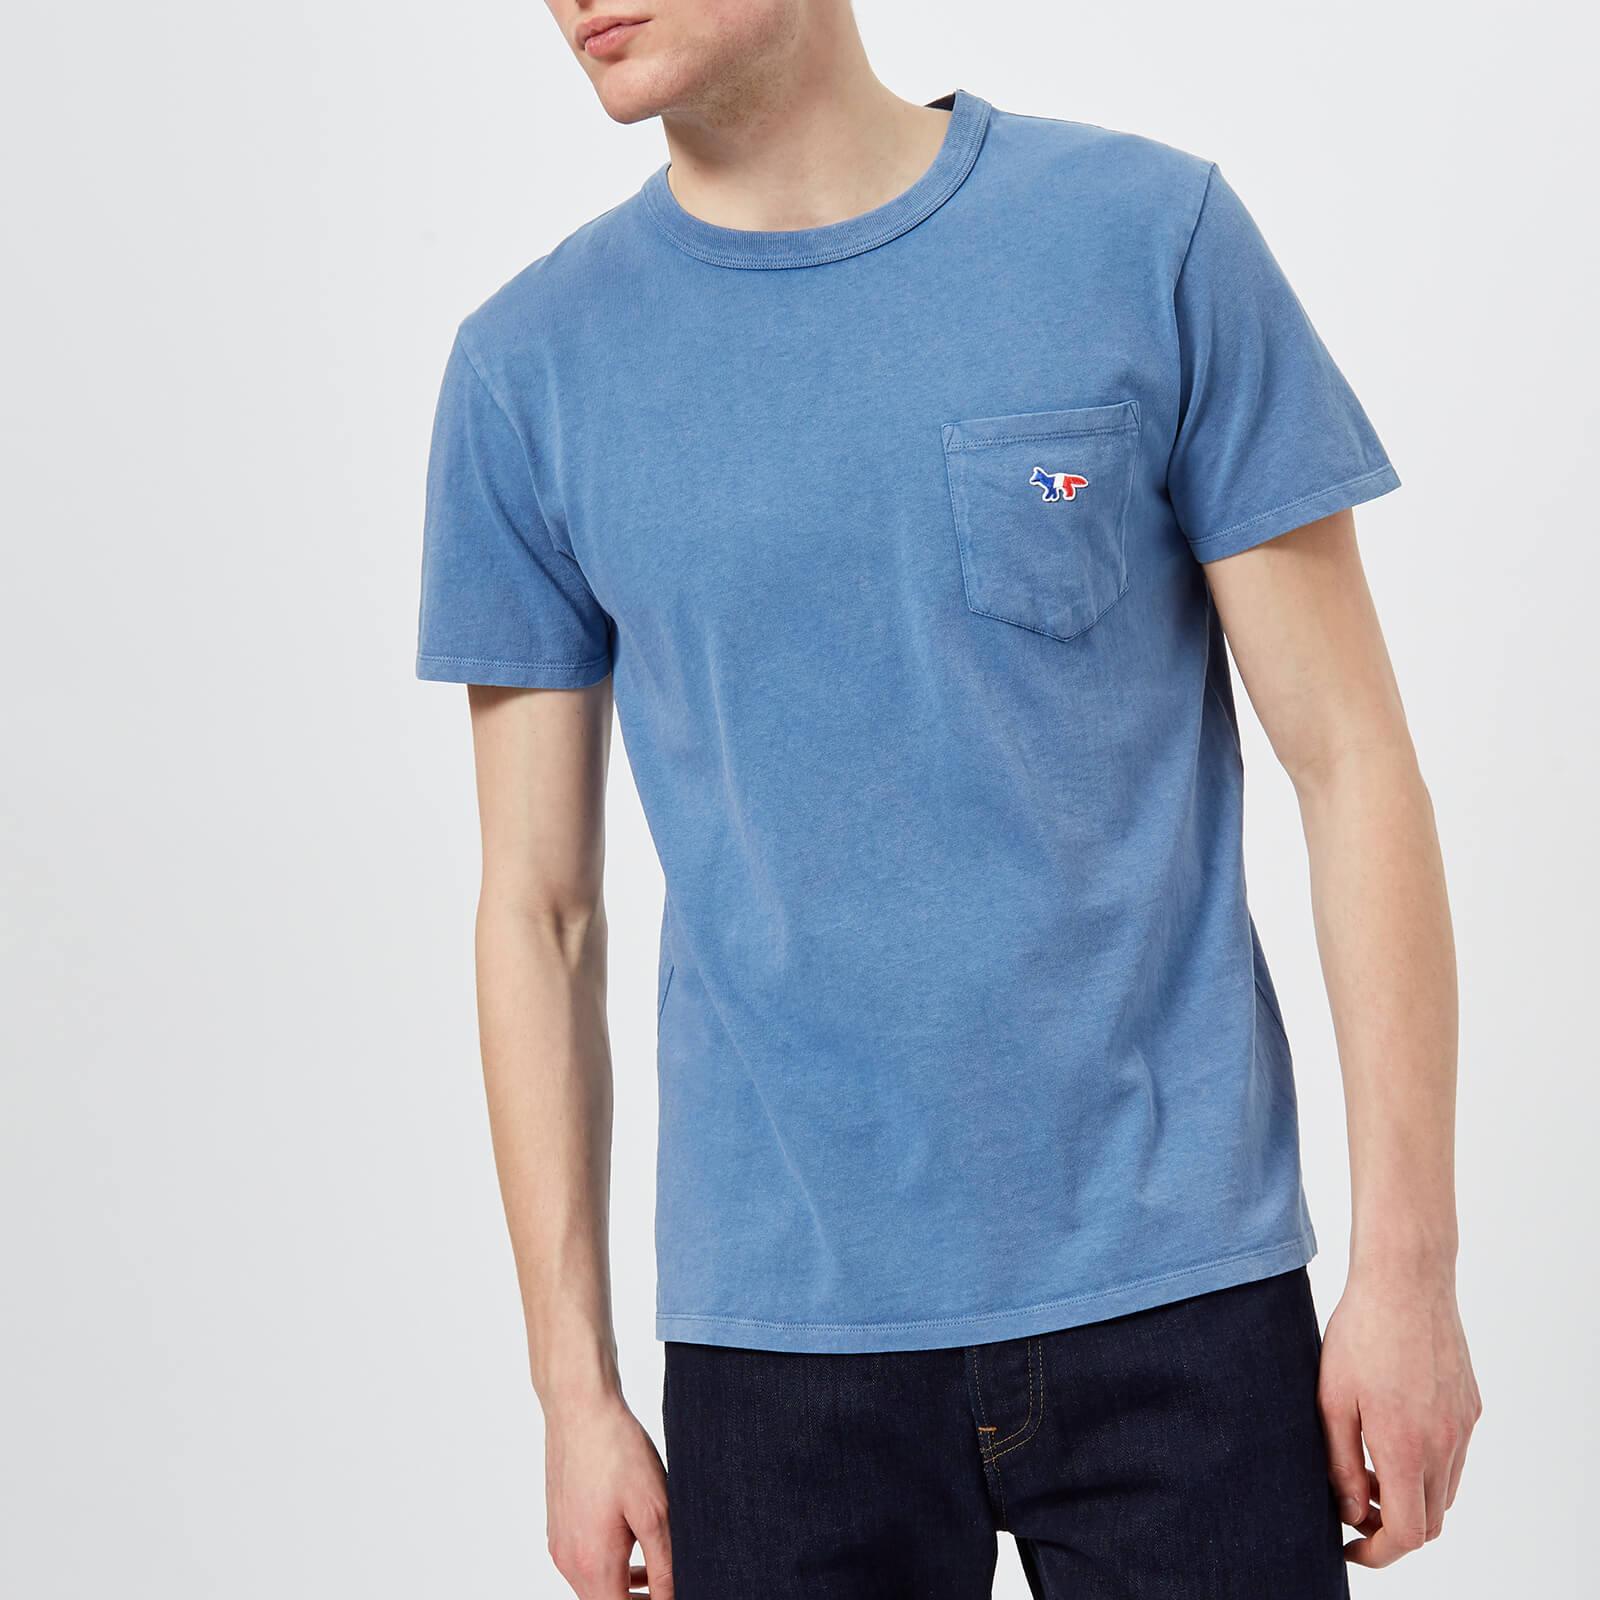 2faaaf3c3bed Maison Kitsuné Men s Tricolor Fox Patch T-Shirt - Blue - Free UK Delivery  over £50